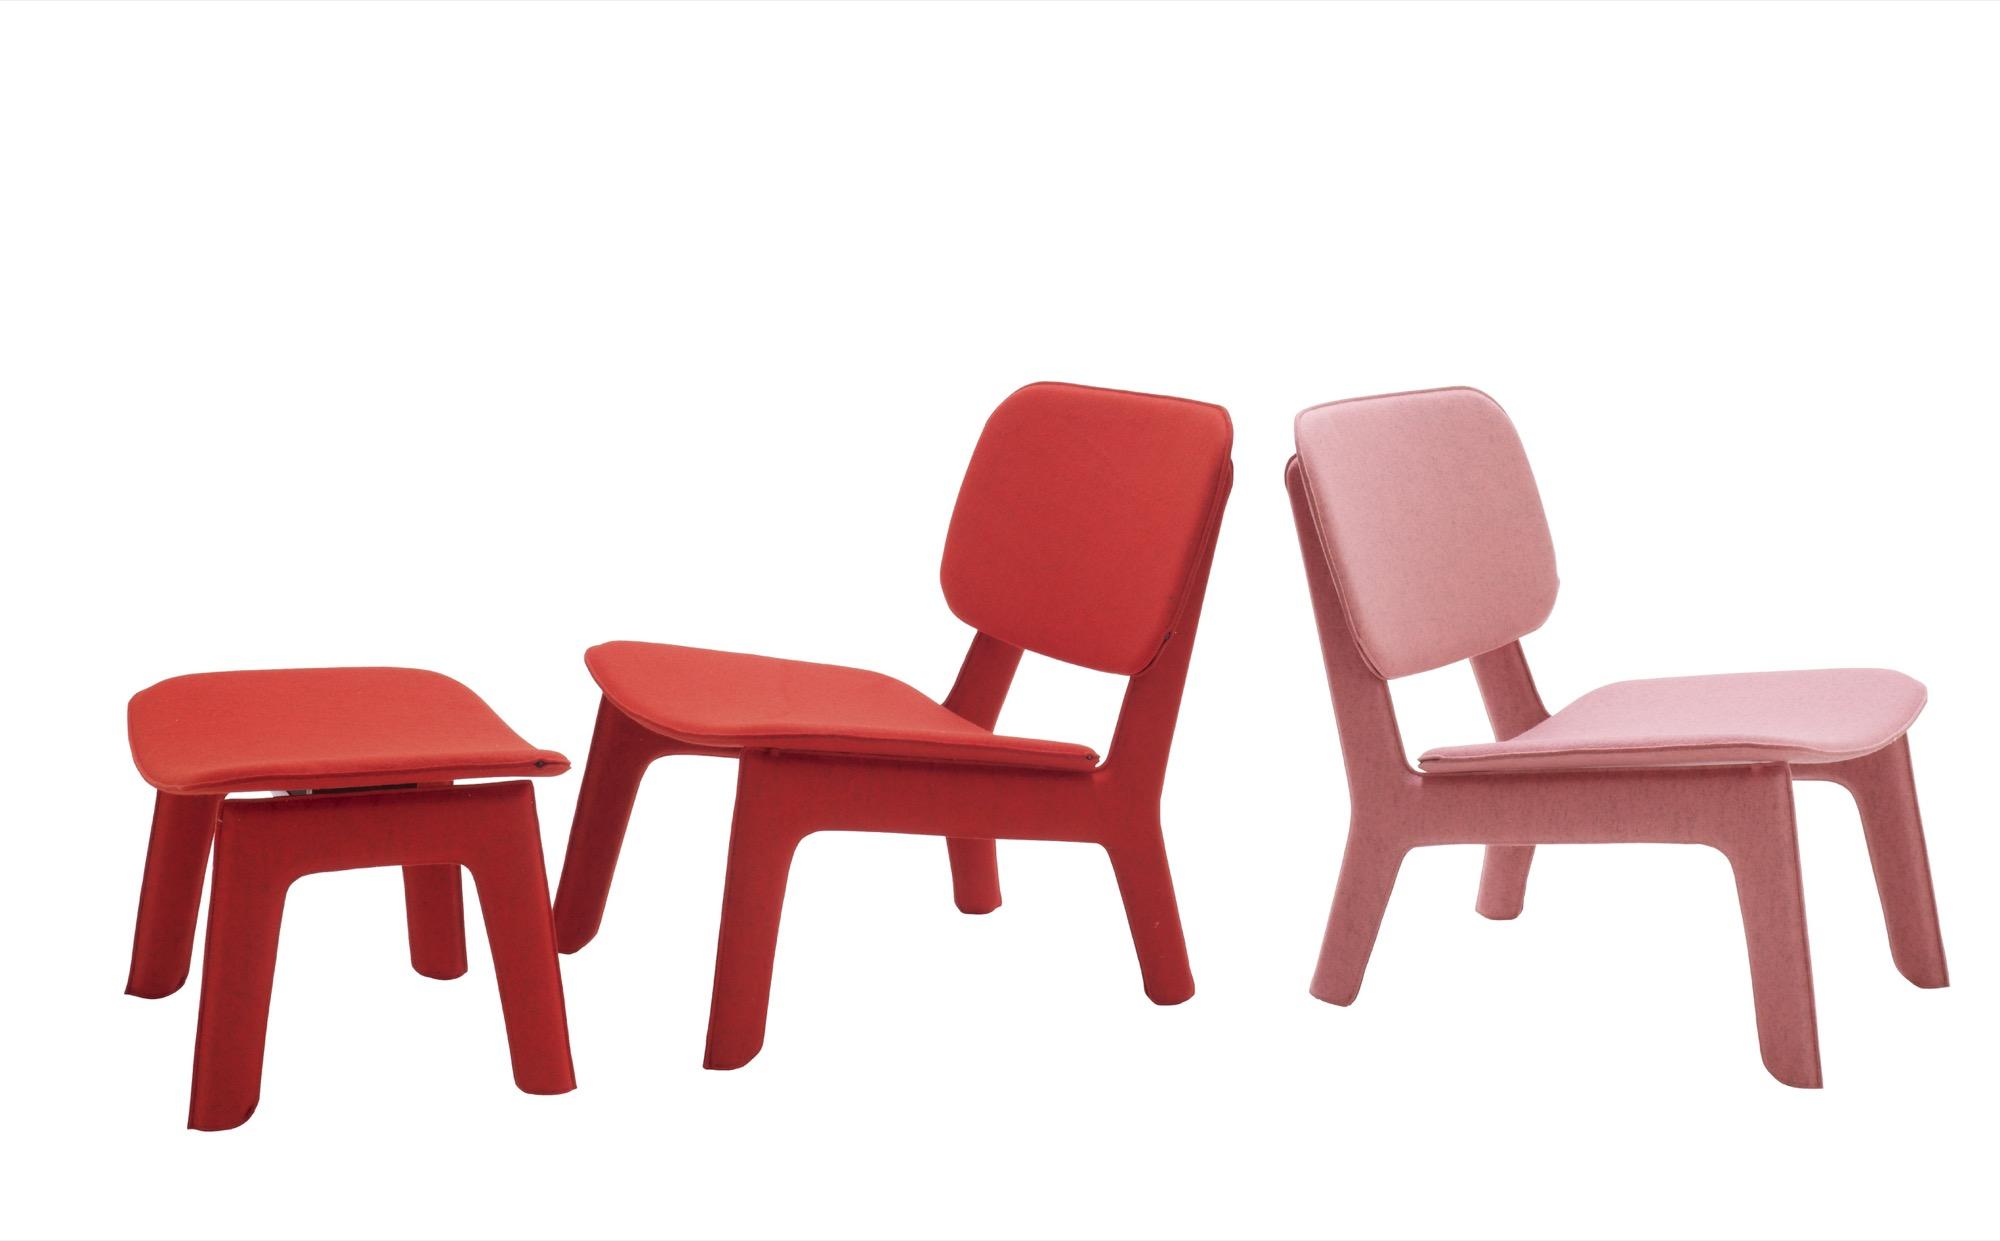 Felt Chairs by Ligne Roset / design by Delo Londo